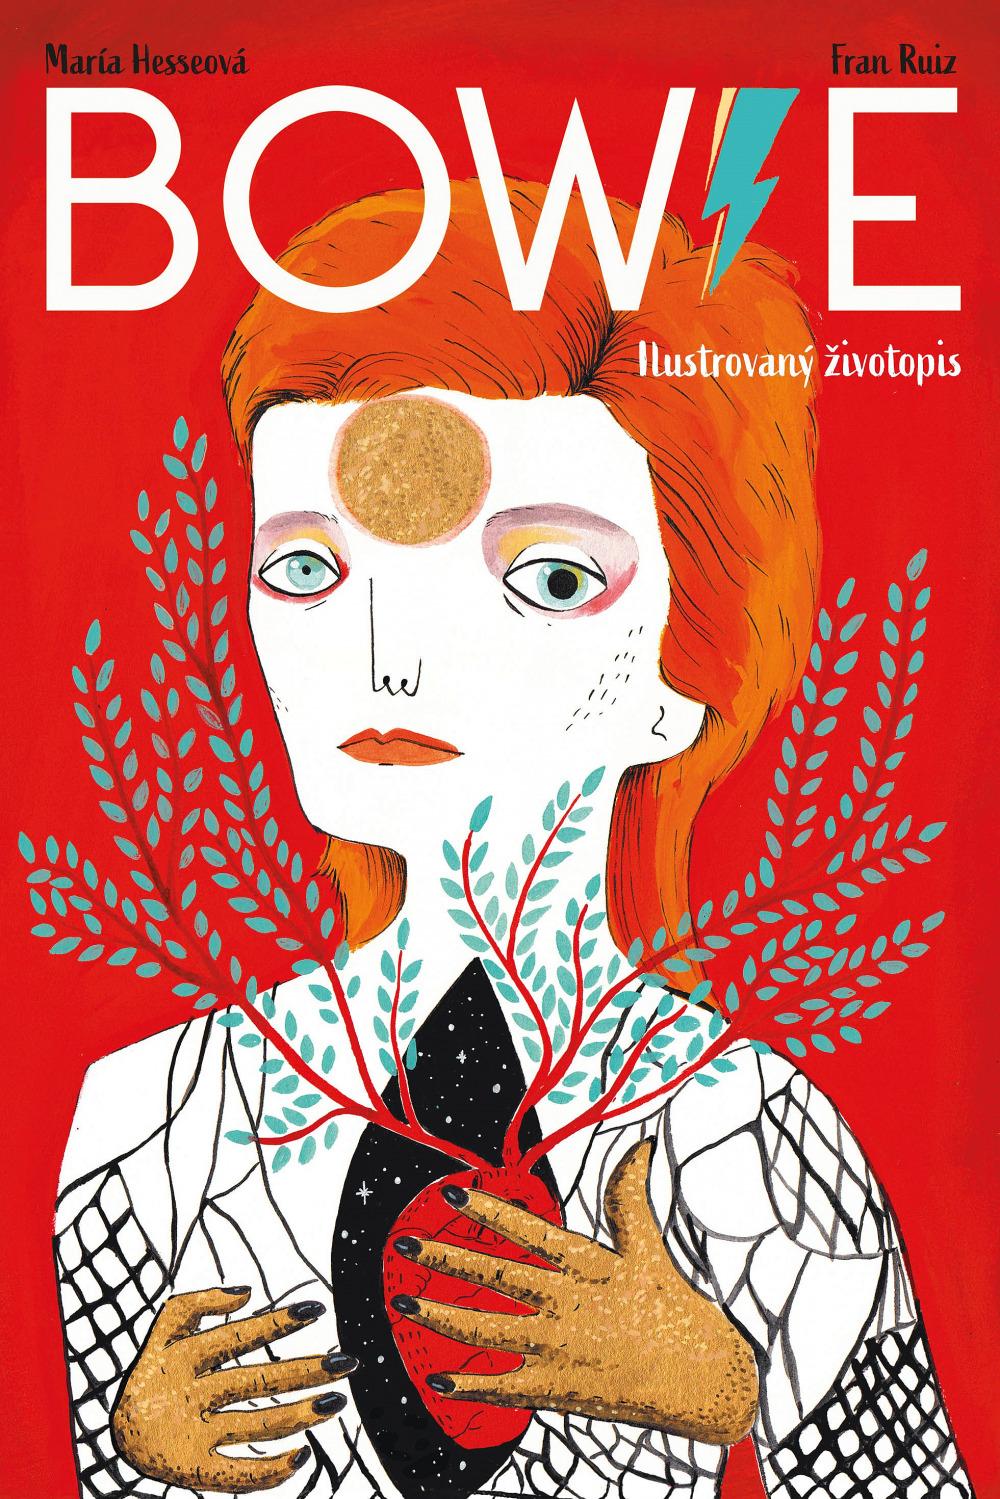 Bowie: Ilustrovaný životopis Fran Ruiz   Databáze knih